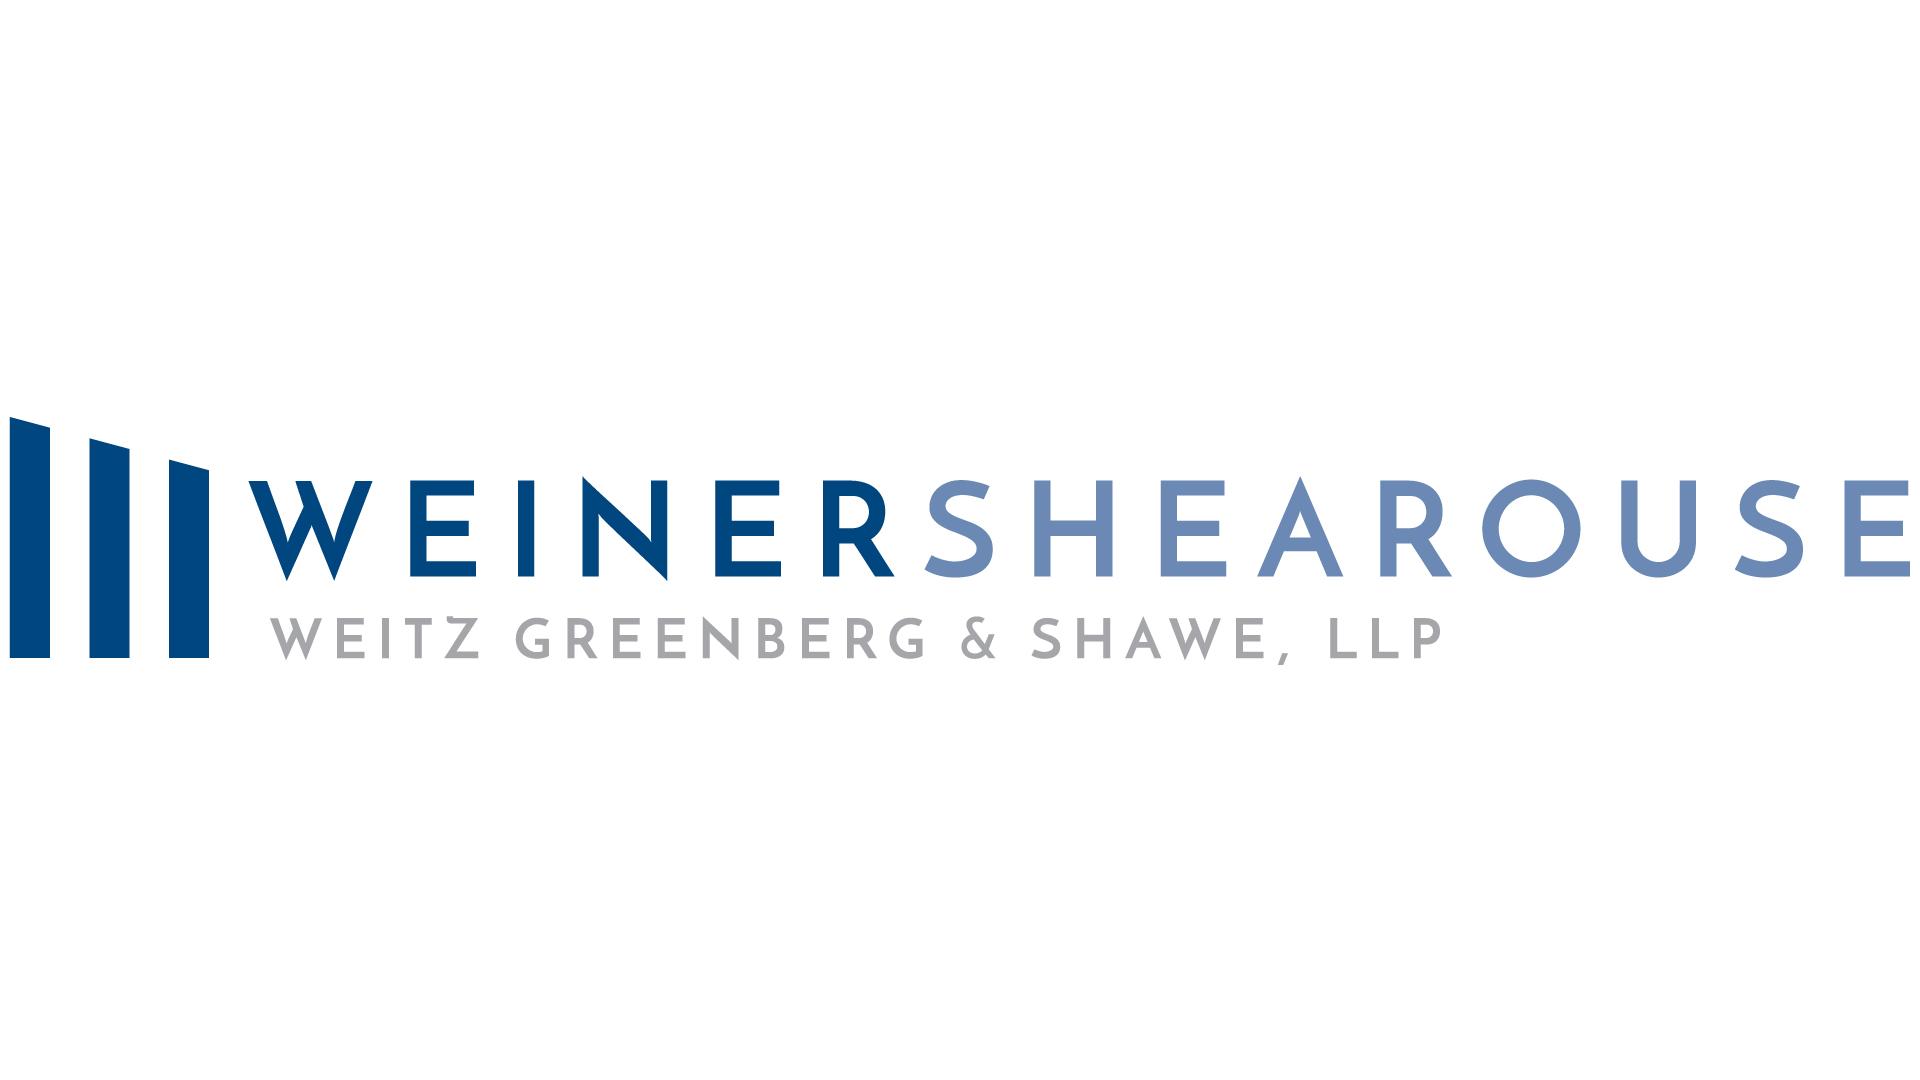 Weiner, Shearouse, Weitz, Greenberg and Shawe Logo Desgin